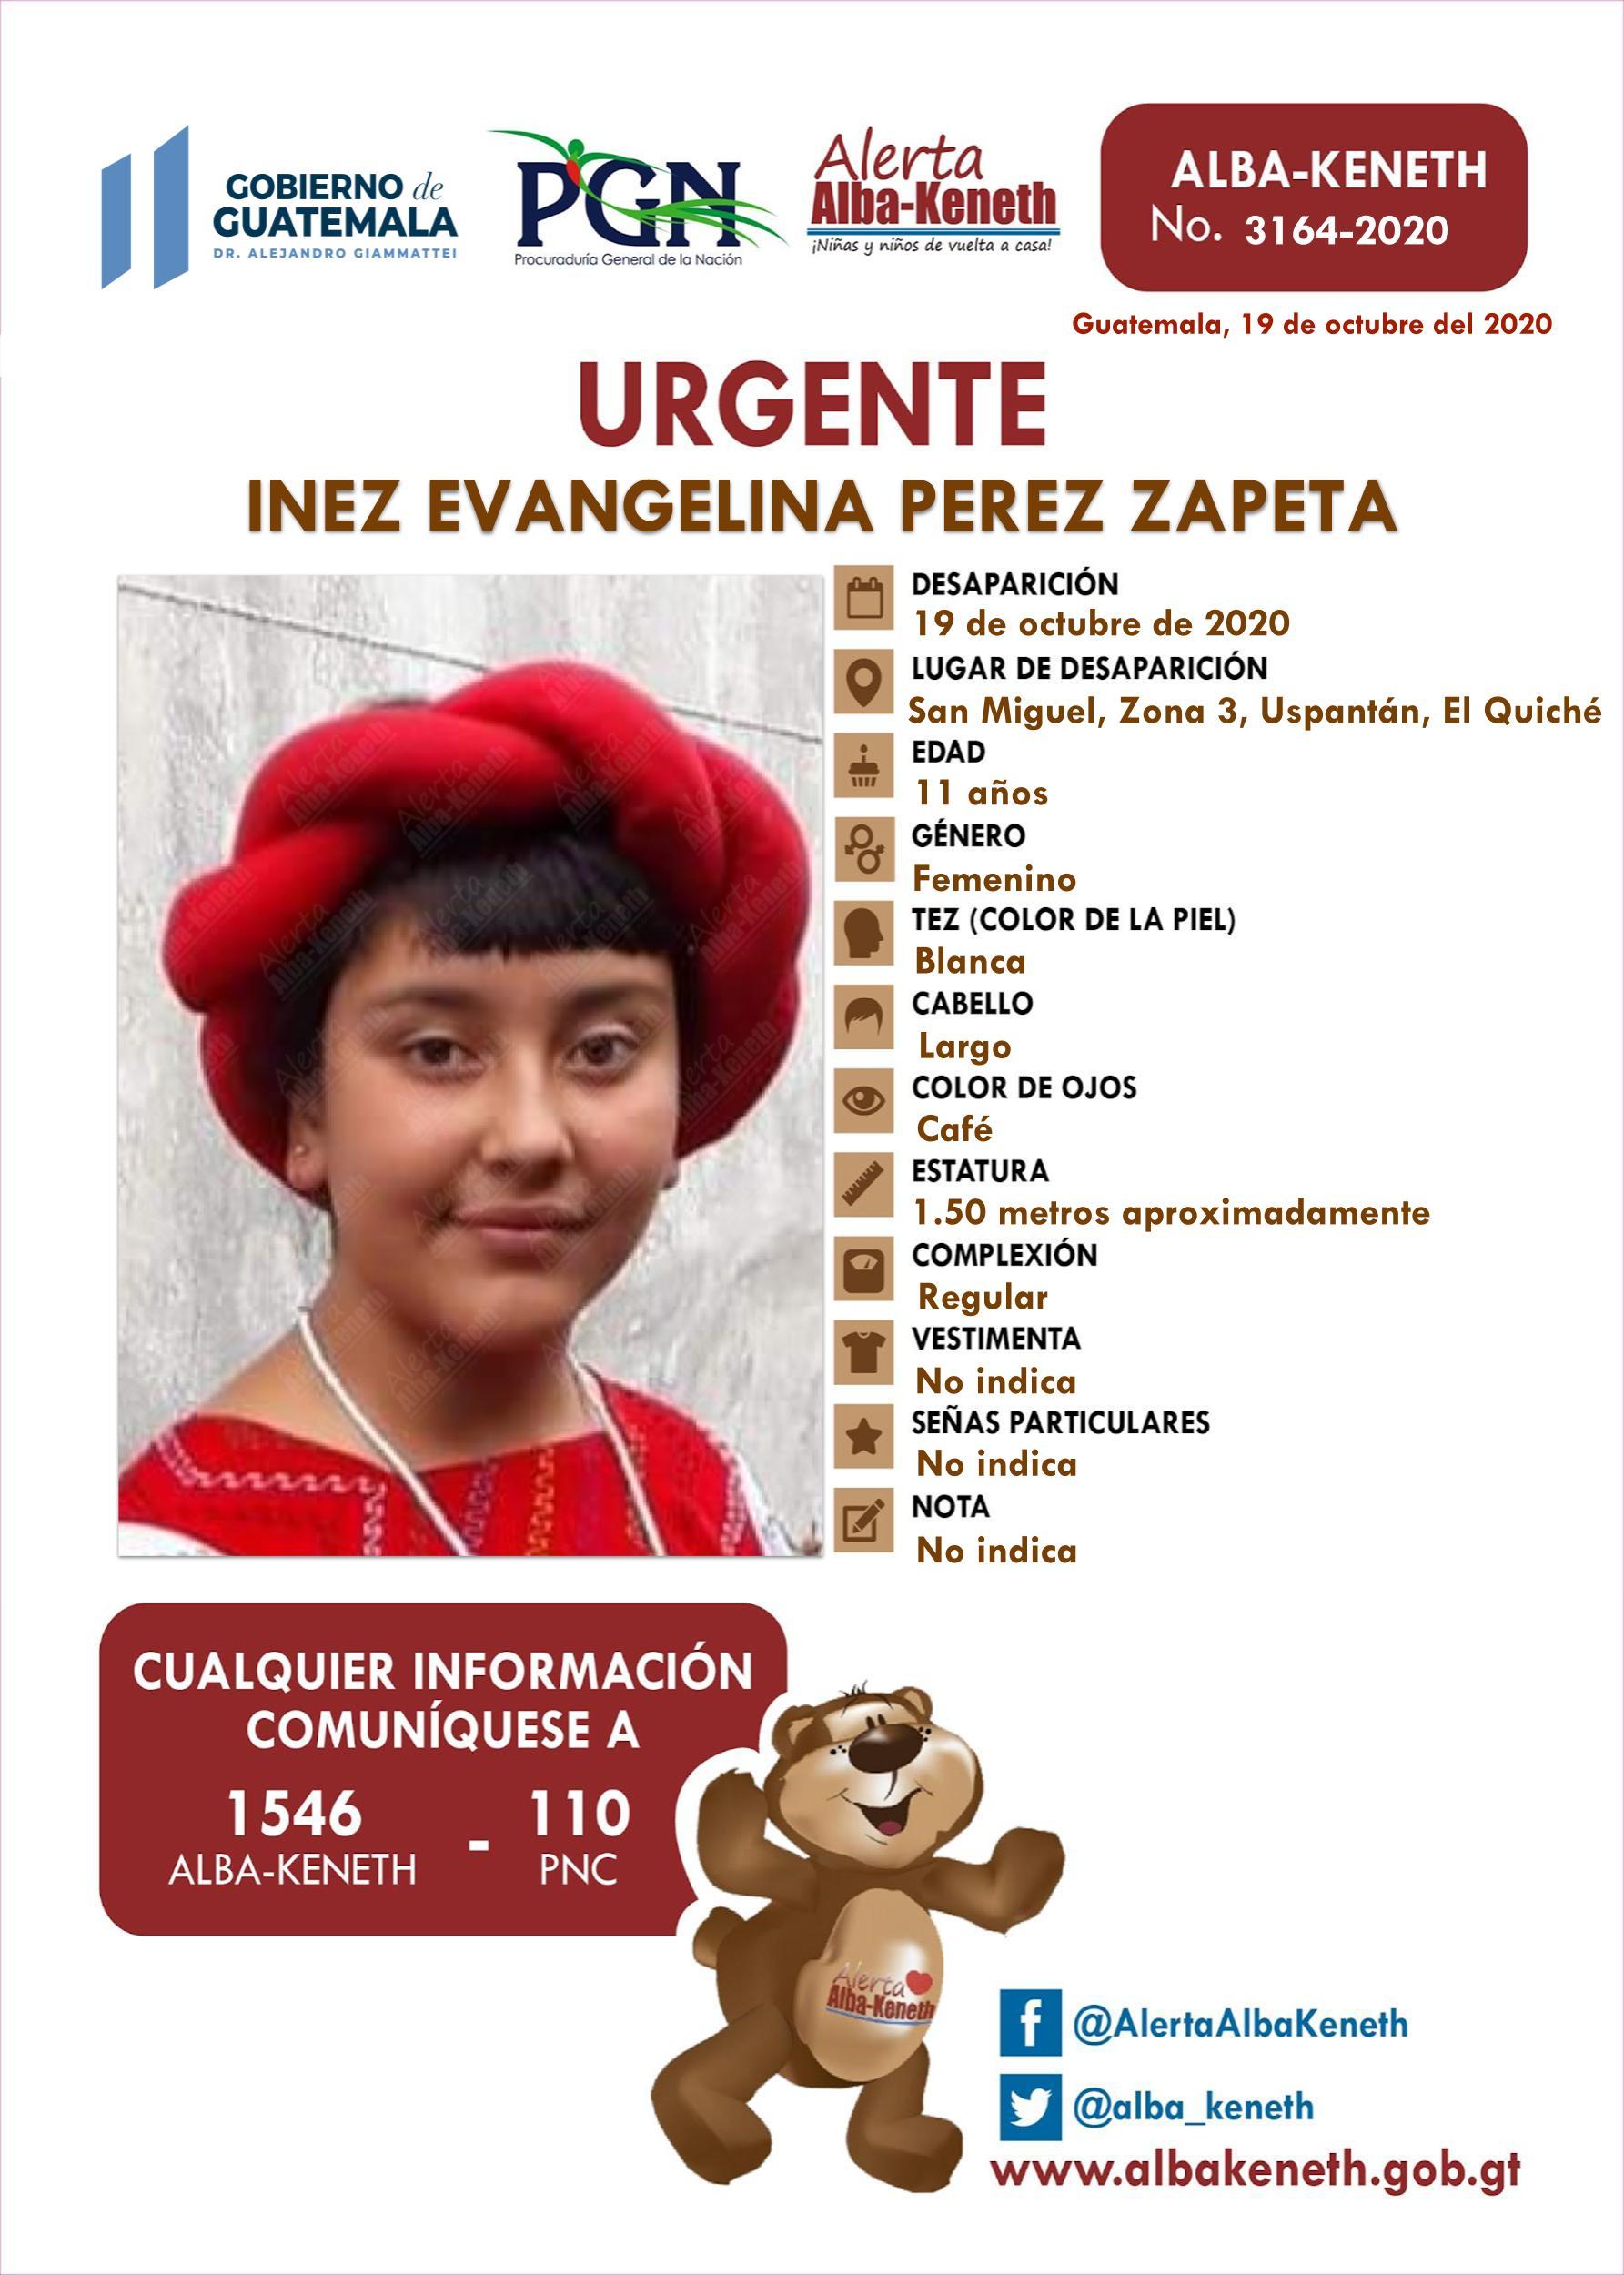 Inez Evangelina Perez Zapeta